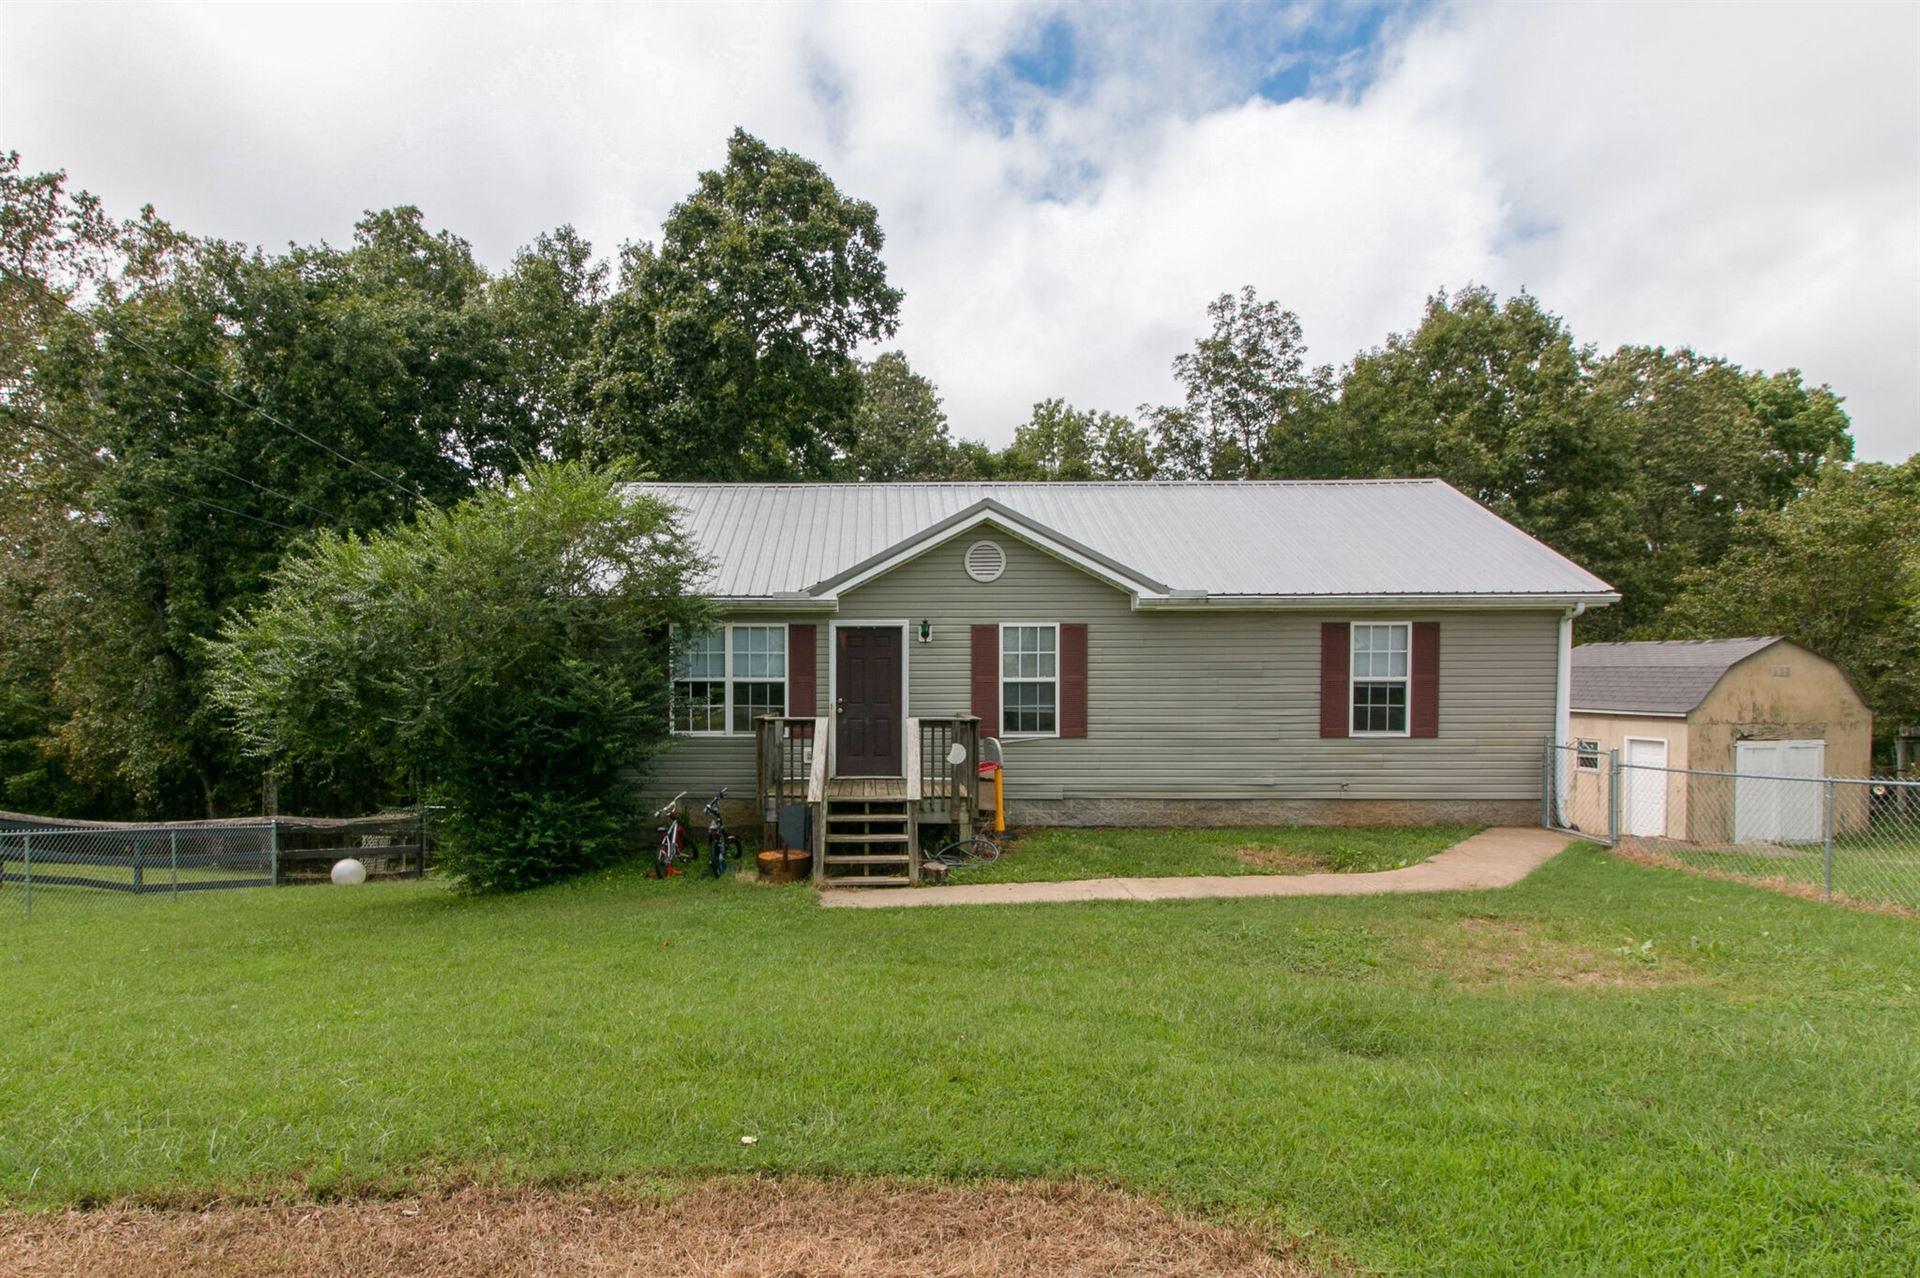 3221 Backridge Rd, Woodlawn, TN 37191 - MLS#: 2291837